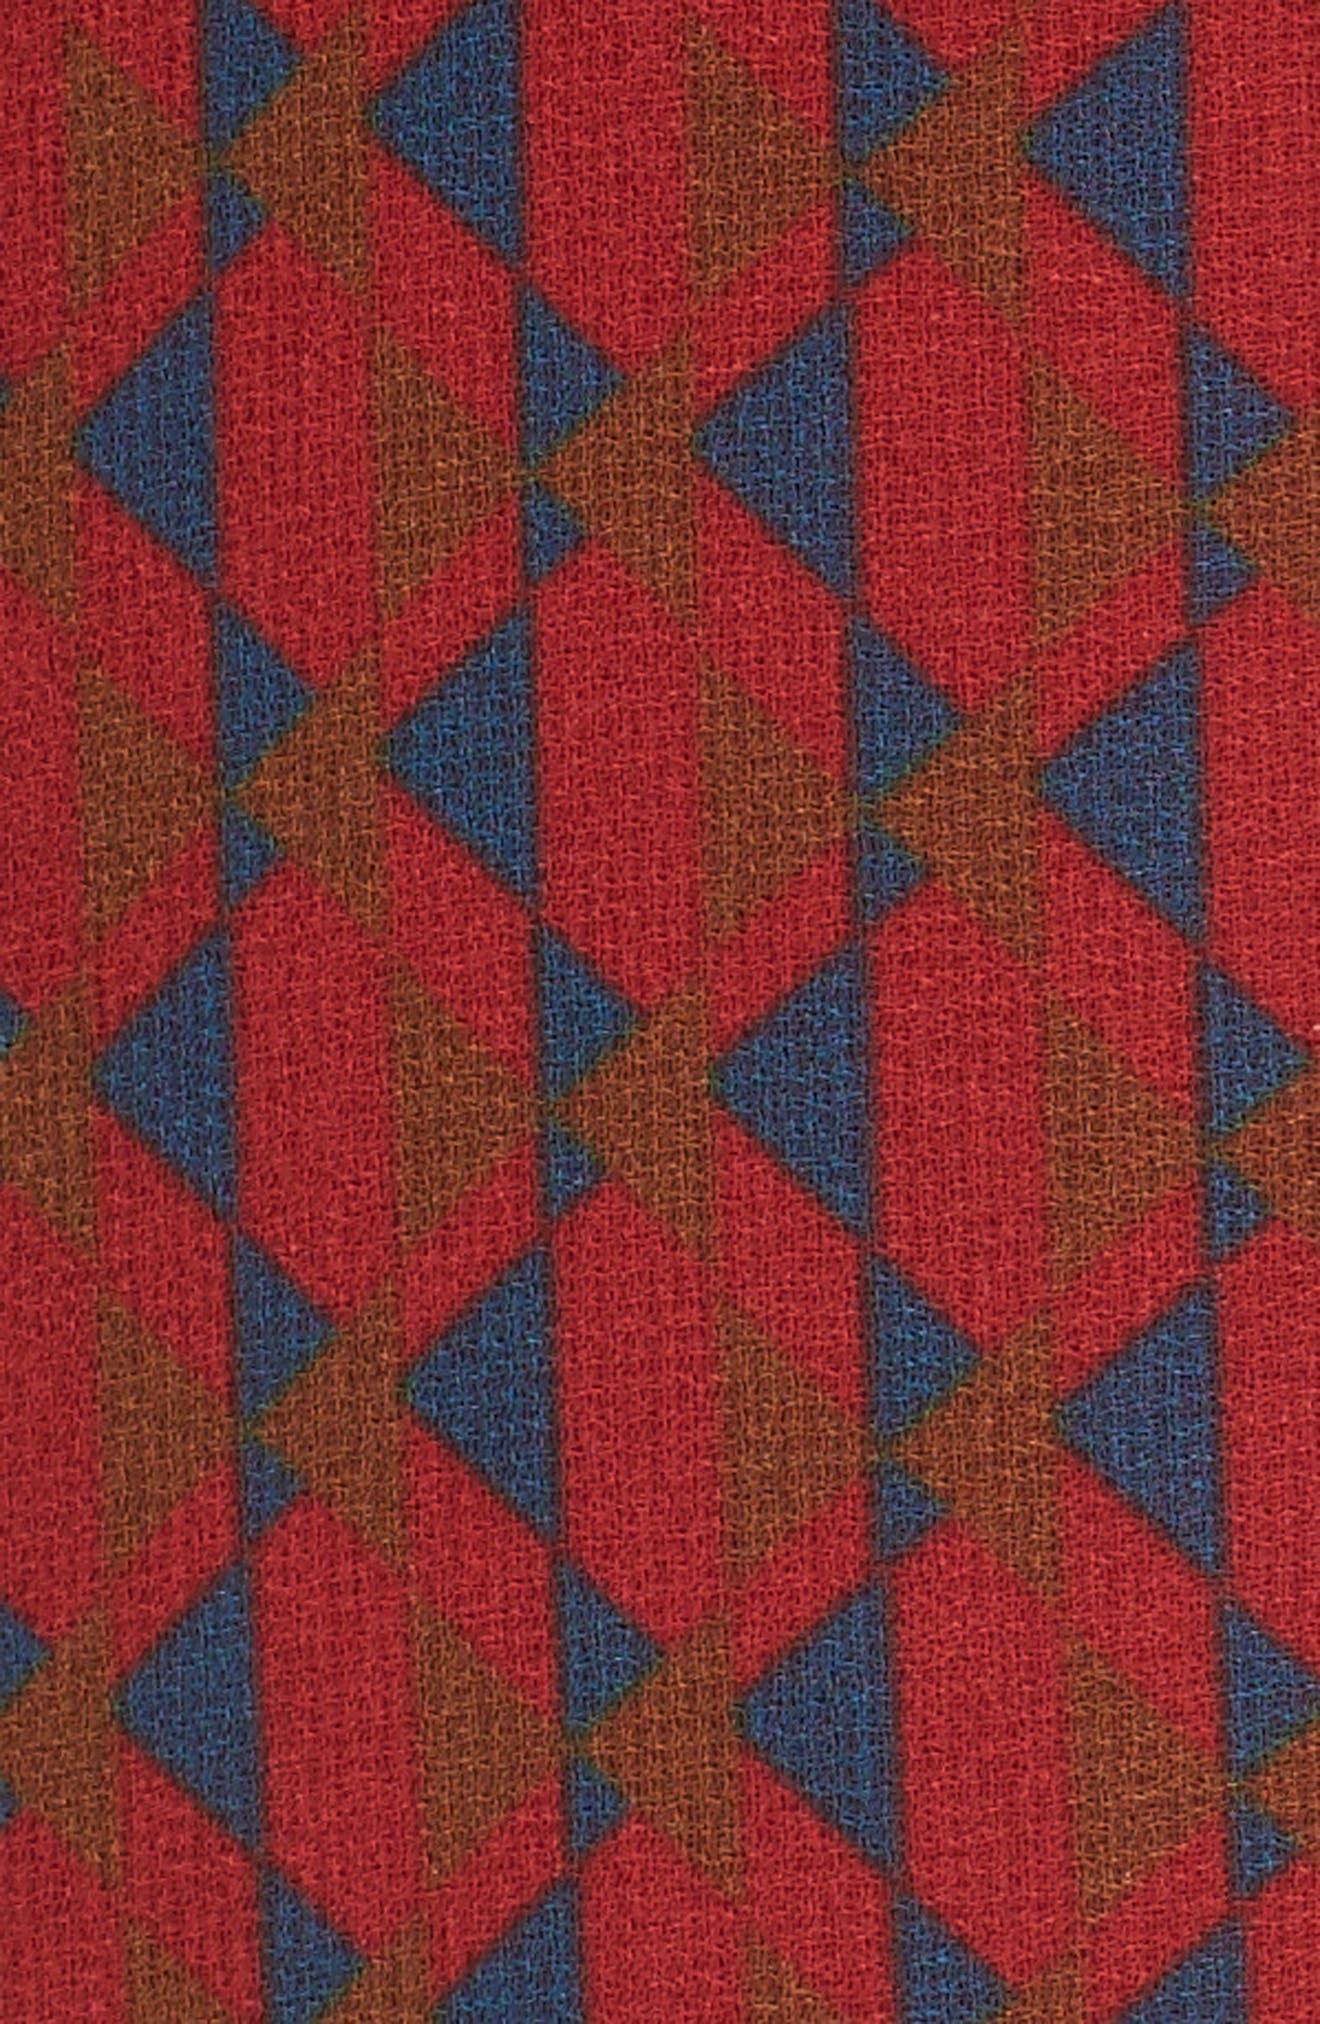 Eryn Ruffle Bell Sleeve Blouse,                             Alternate thumbnail 5, color,                             600